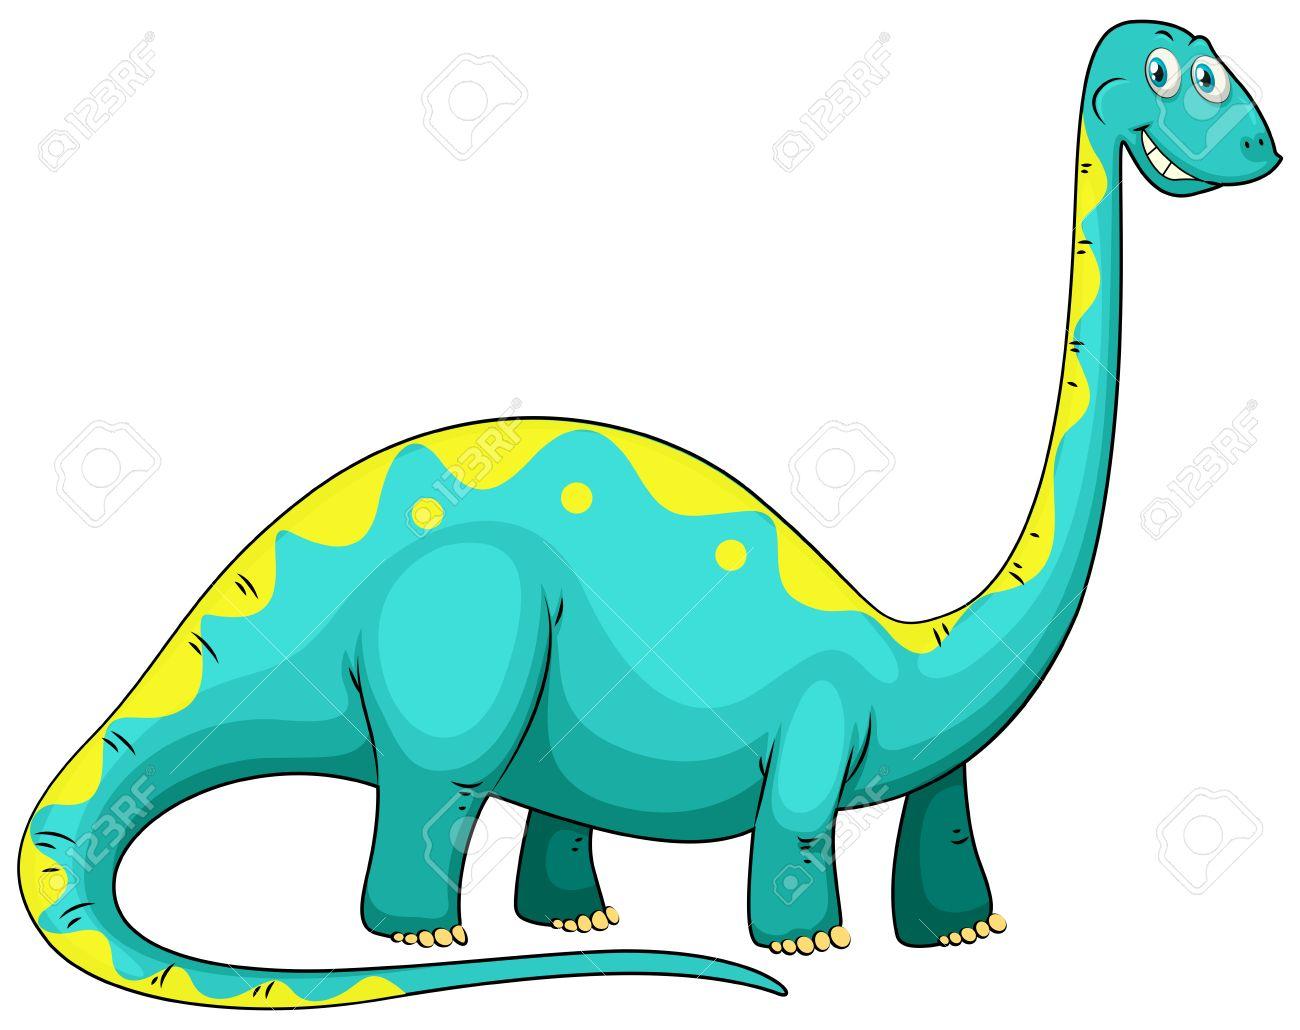 blue dinosaur with long neck illustration royalty free cliparts rh 123rf com dino clipart dino clipart